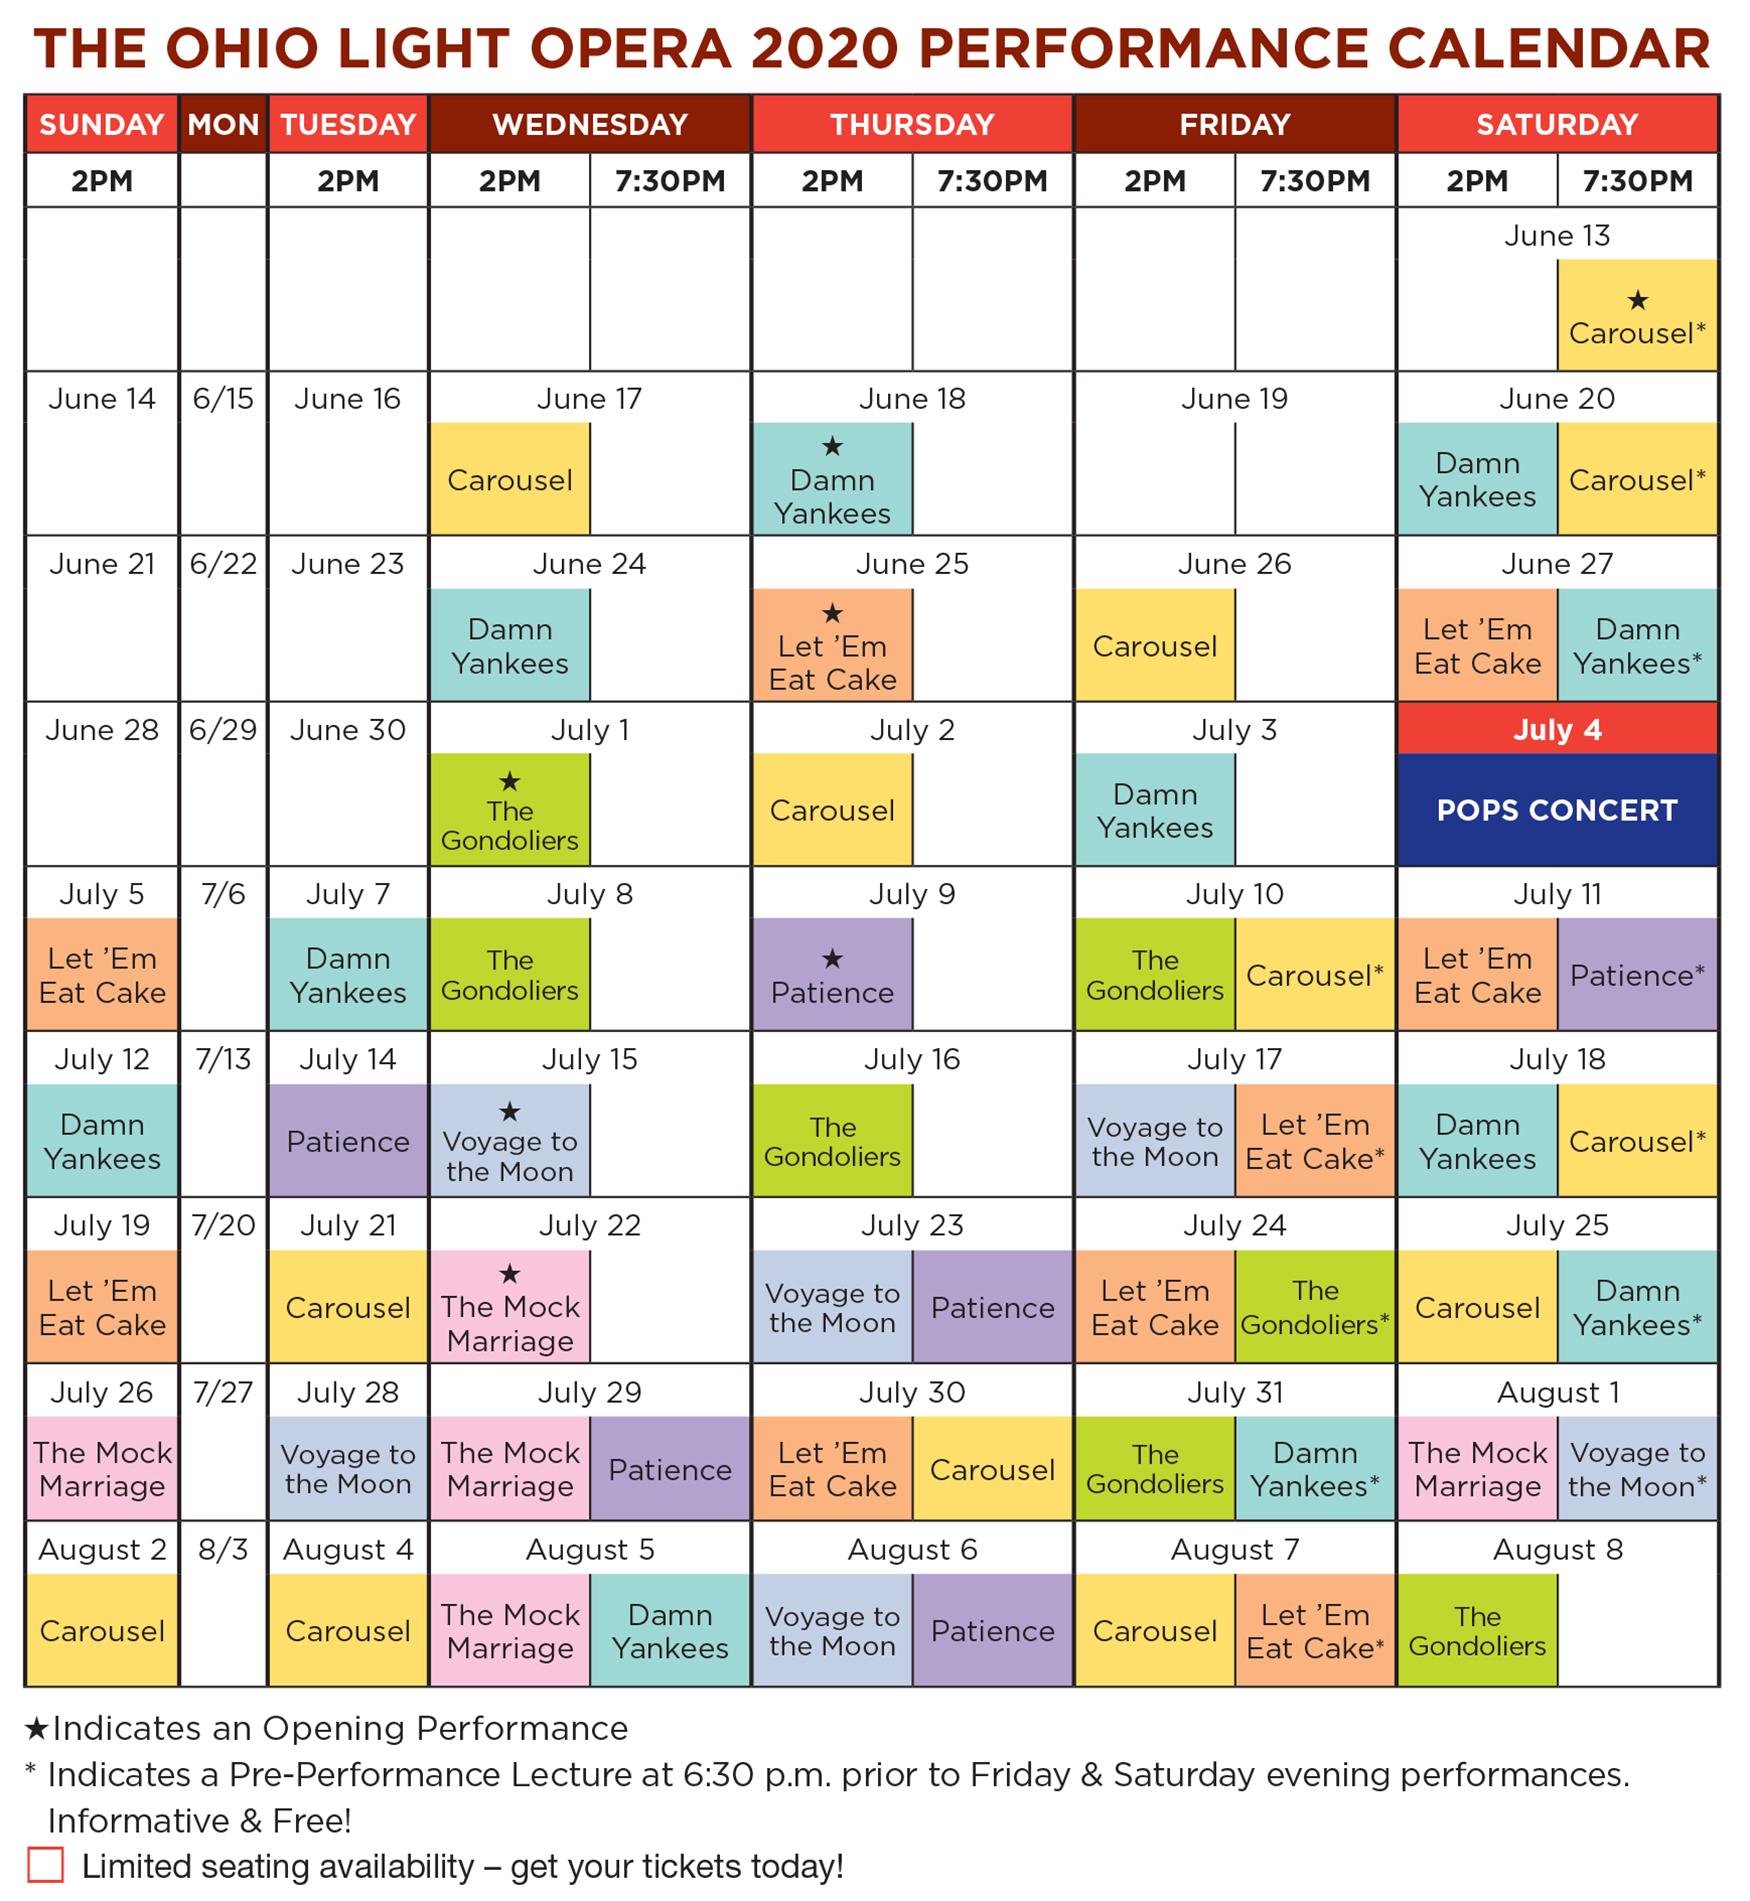 Calendar – The Ohio Light Opera